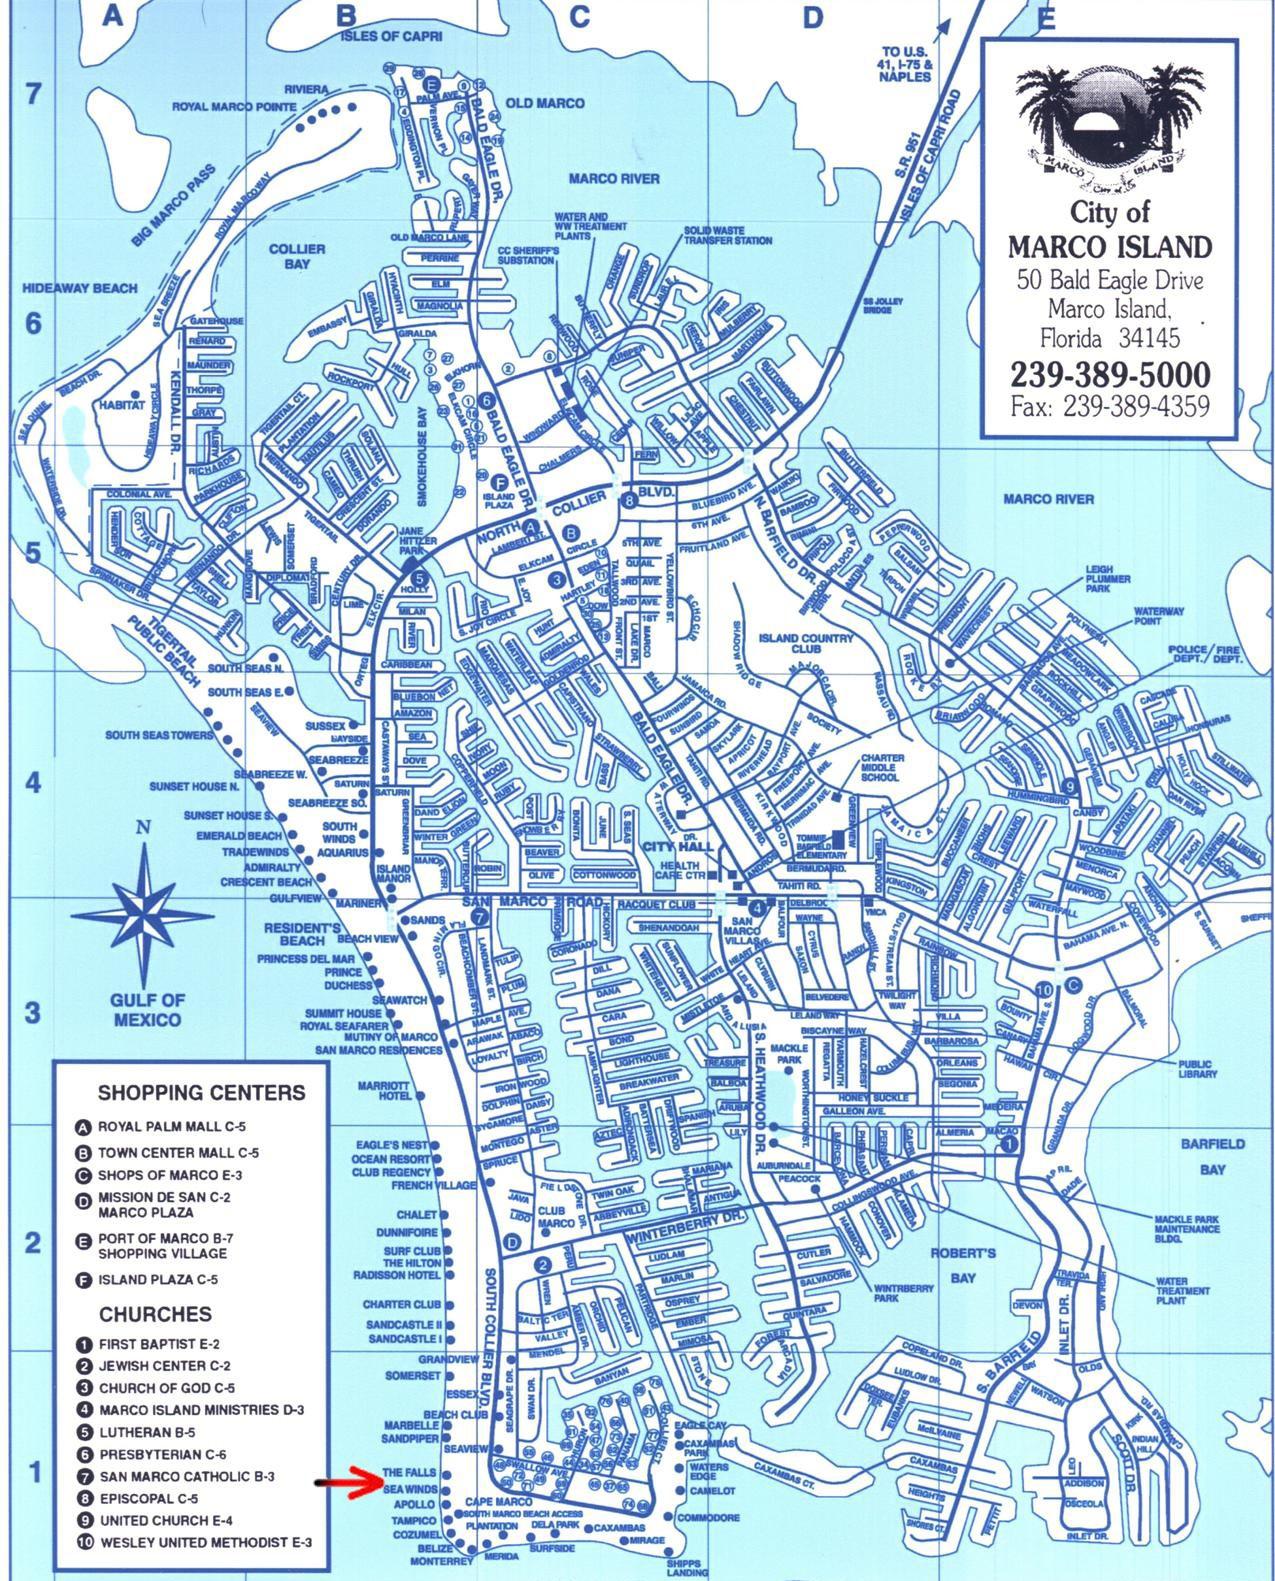 Map Of Sanibel Island Beaches Beach Sanibel Captiva Marco Island - Florida map showing marco island